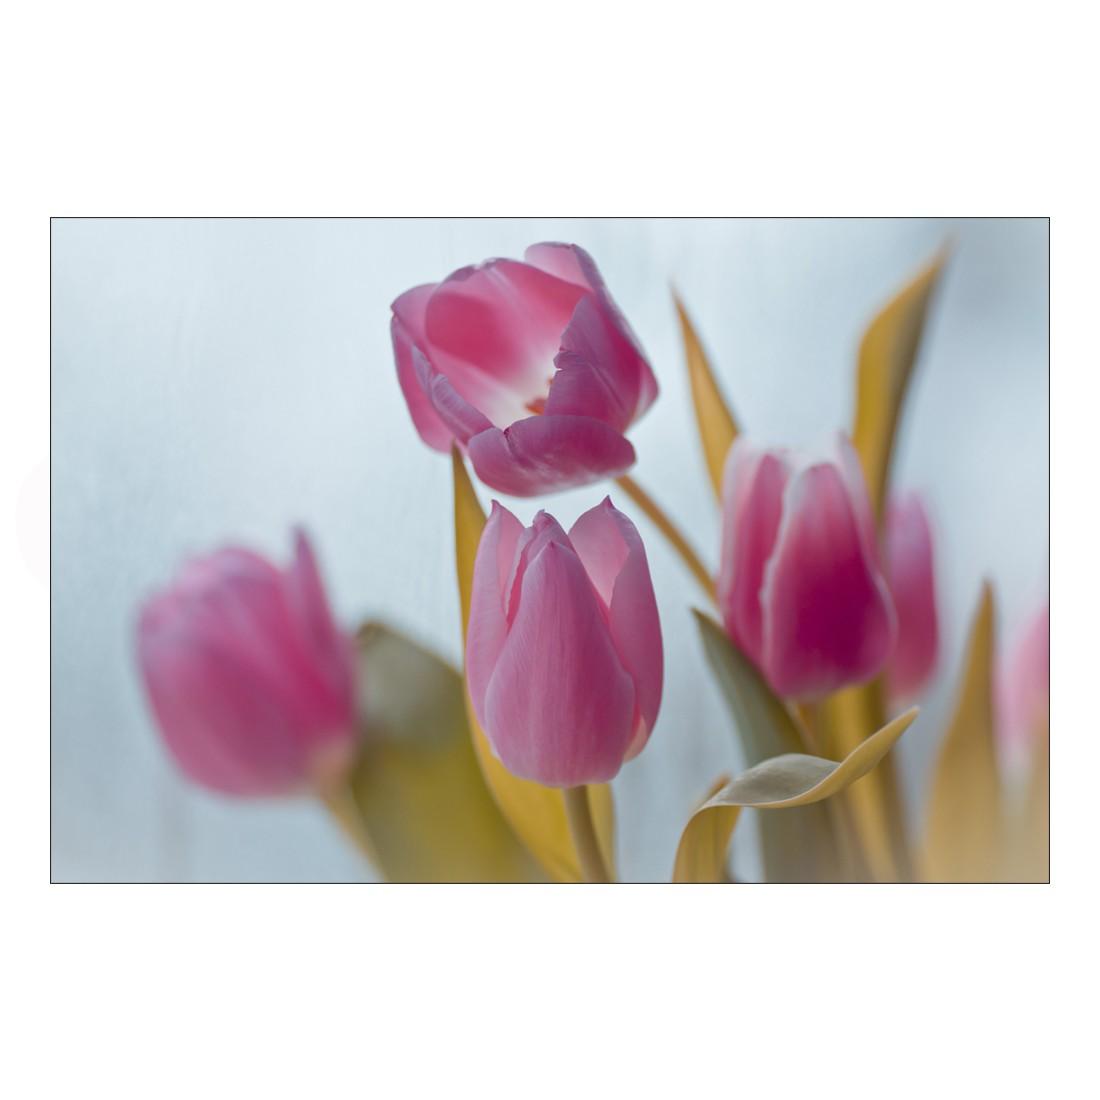 Acrylglasbild Pink Tulpis – Abmessung 60×40 cm, Gallery of Innovative Art günstig bestellen